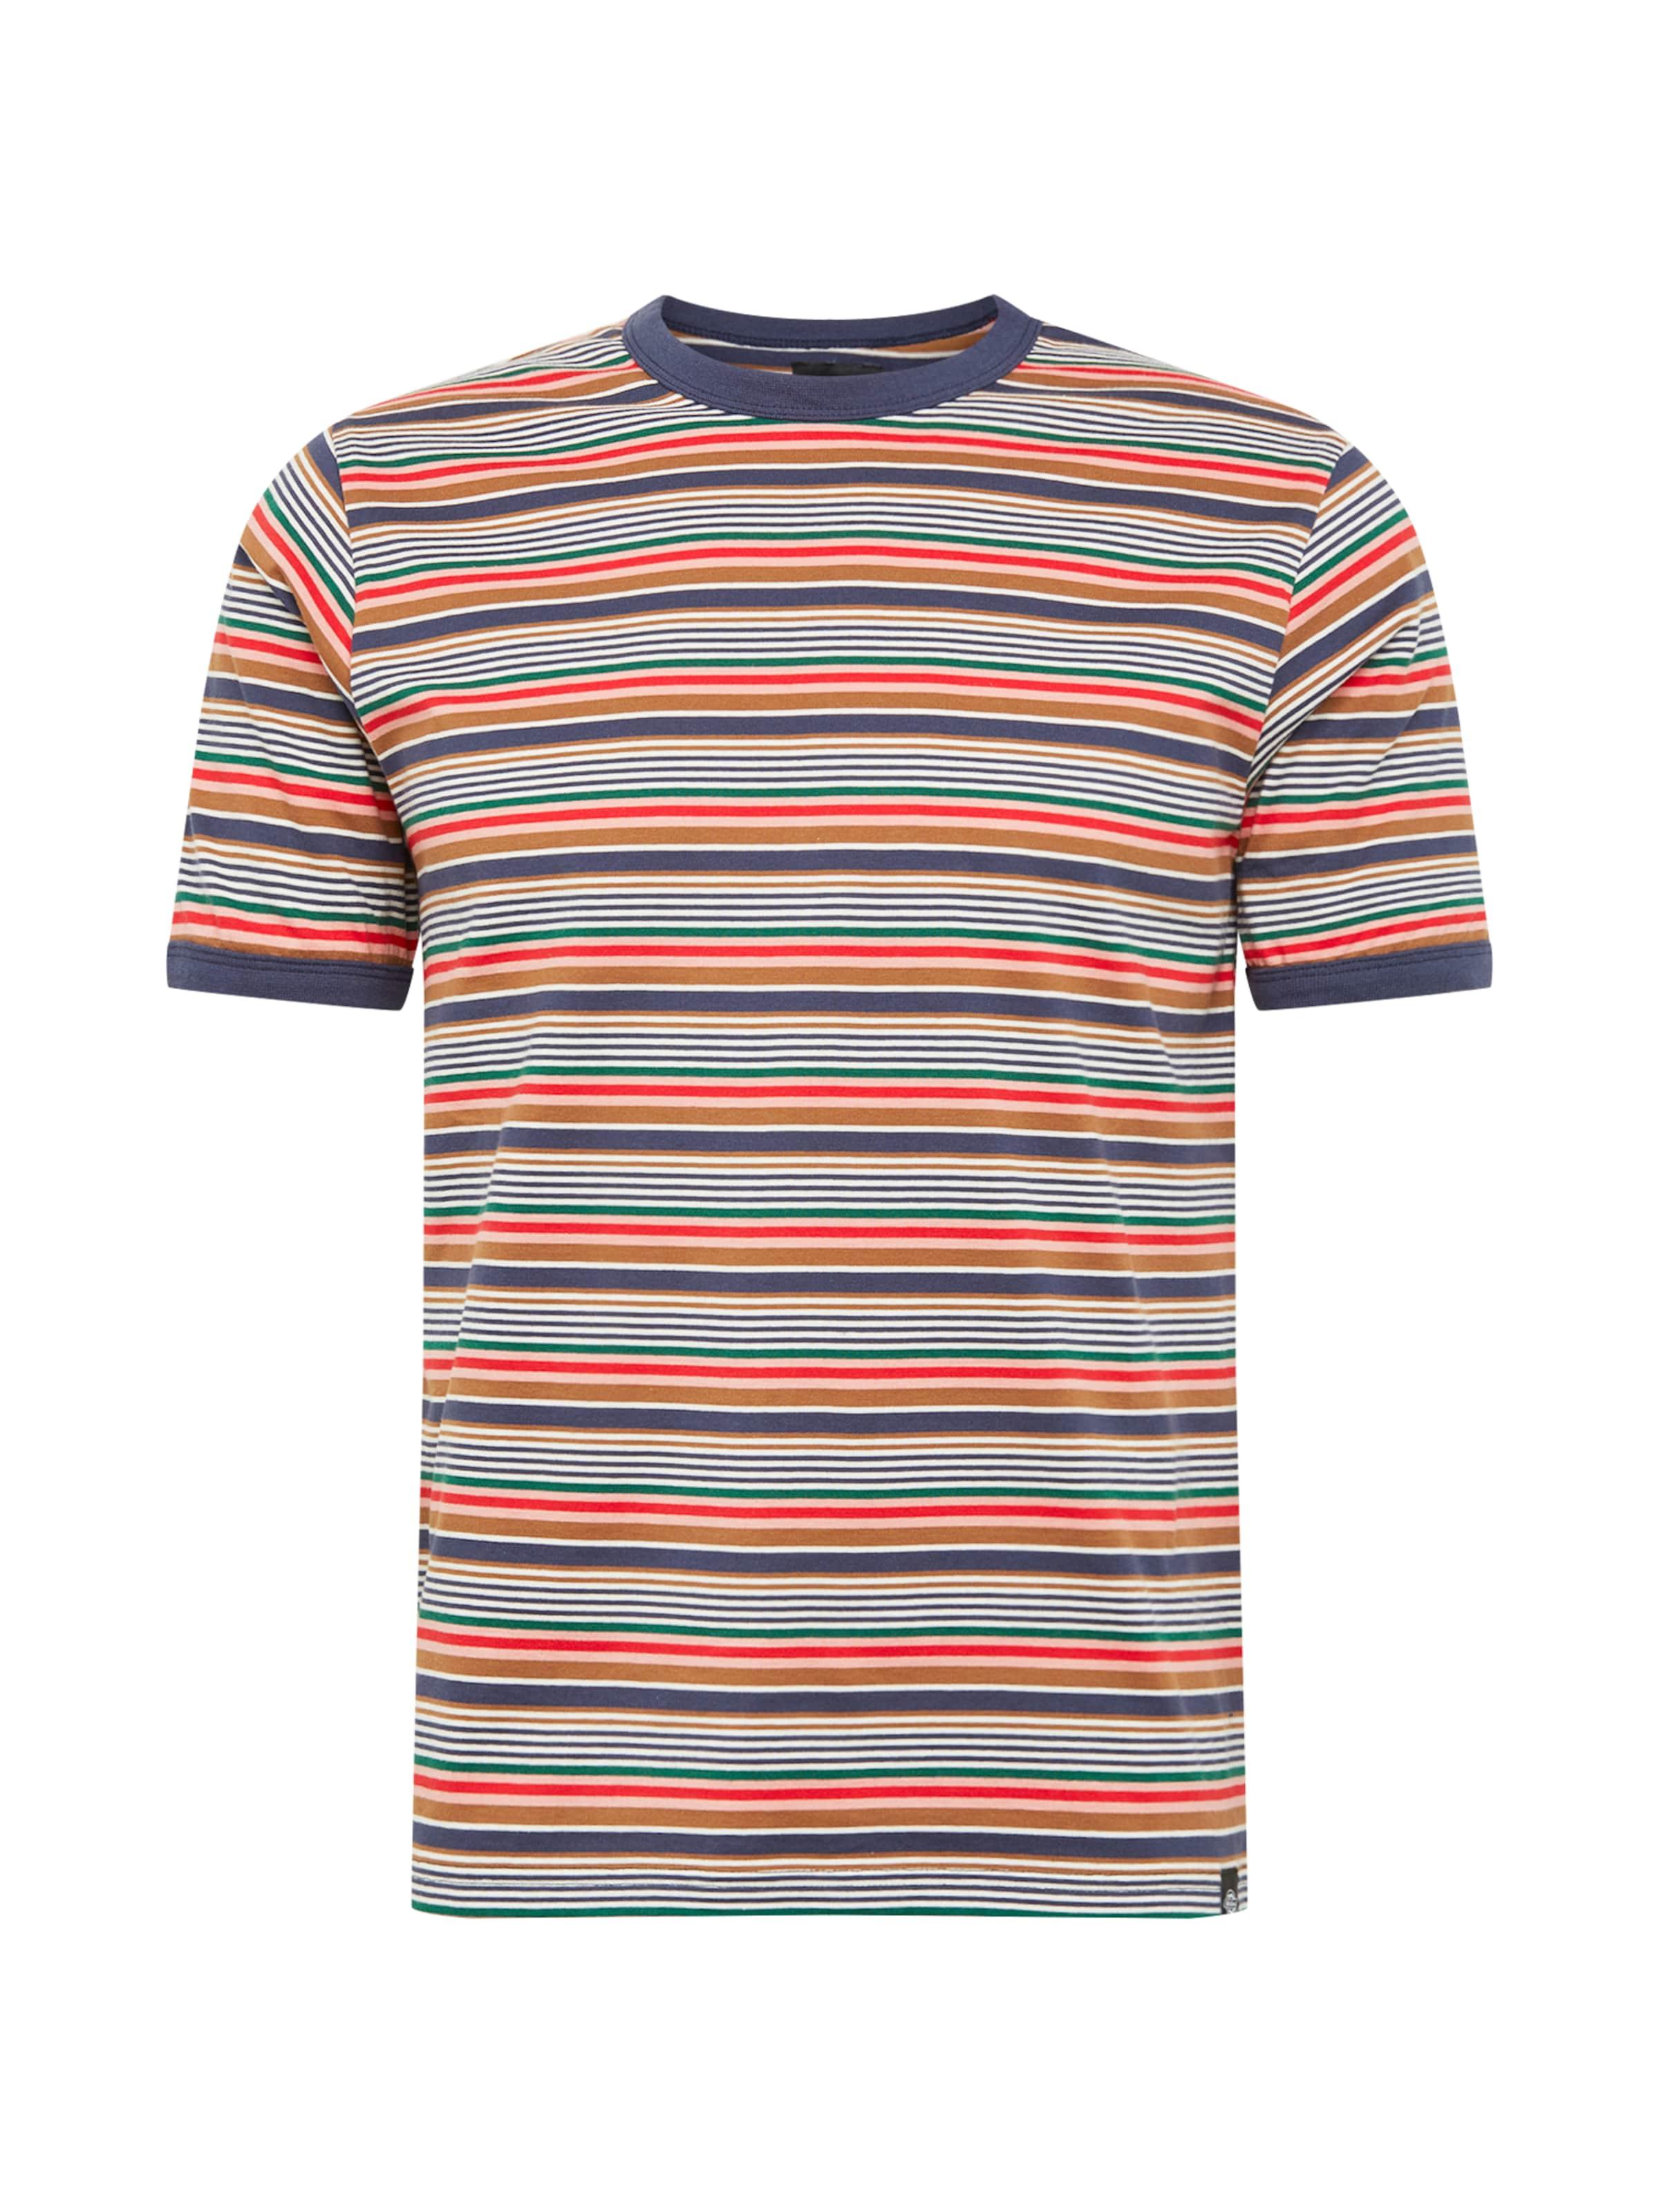 In Paltz' Shirt Dickies NavyRood 'new Ivbf7gY6y